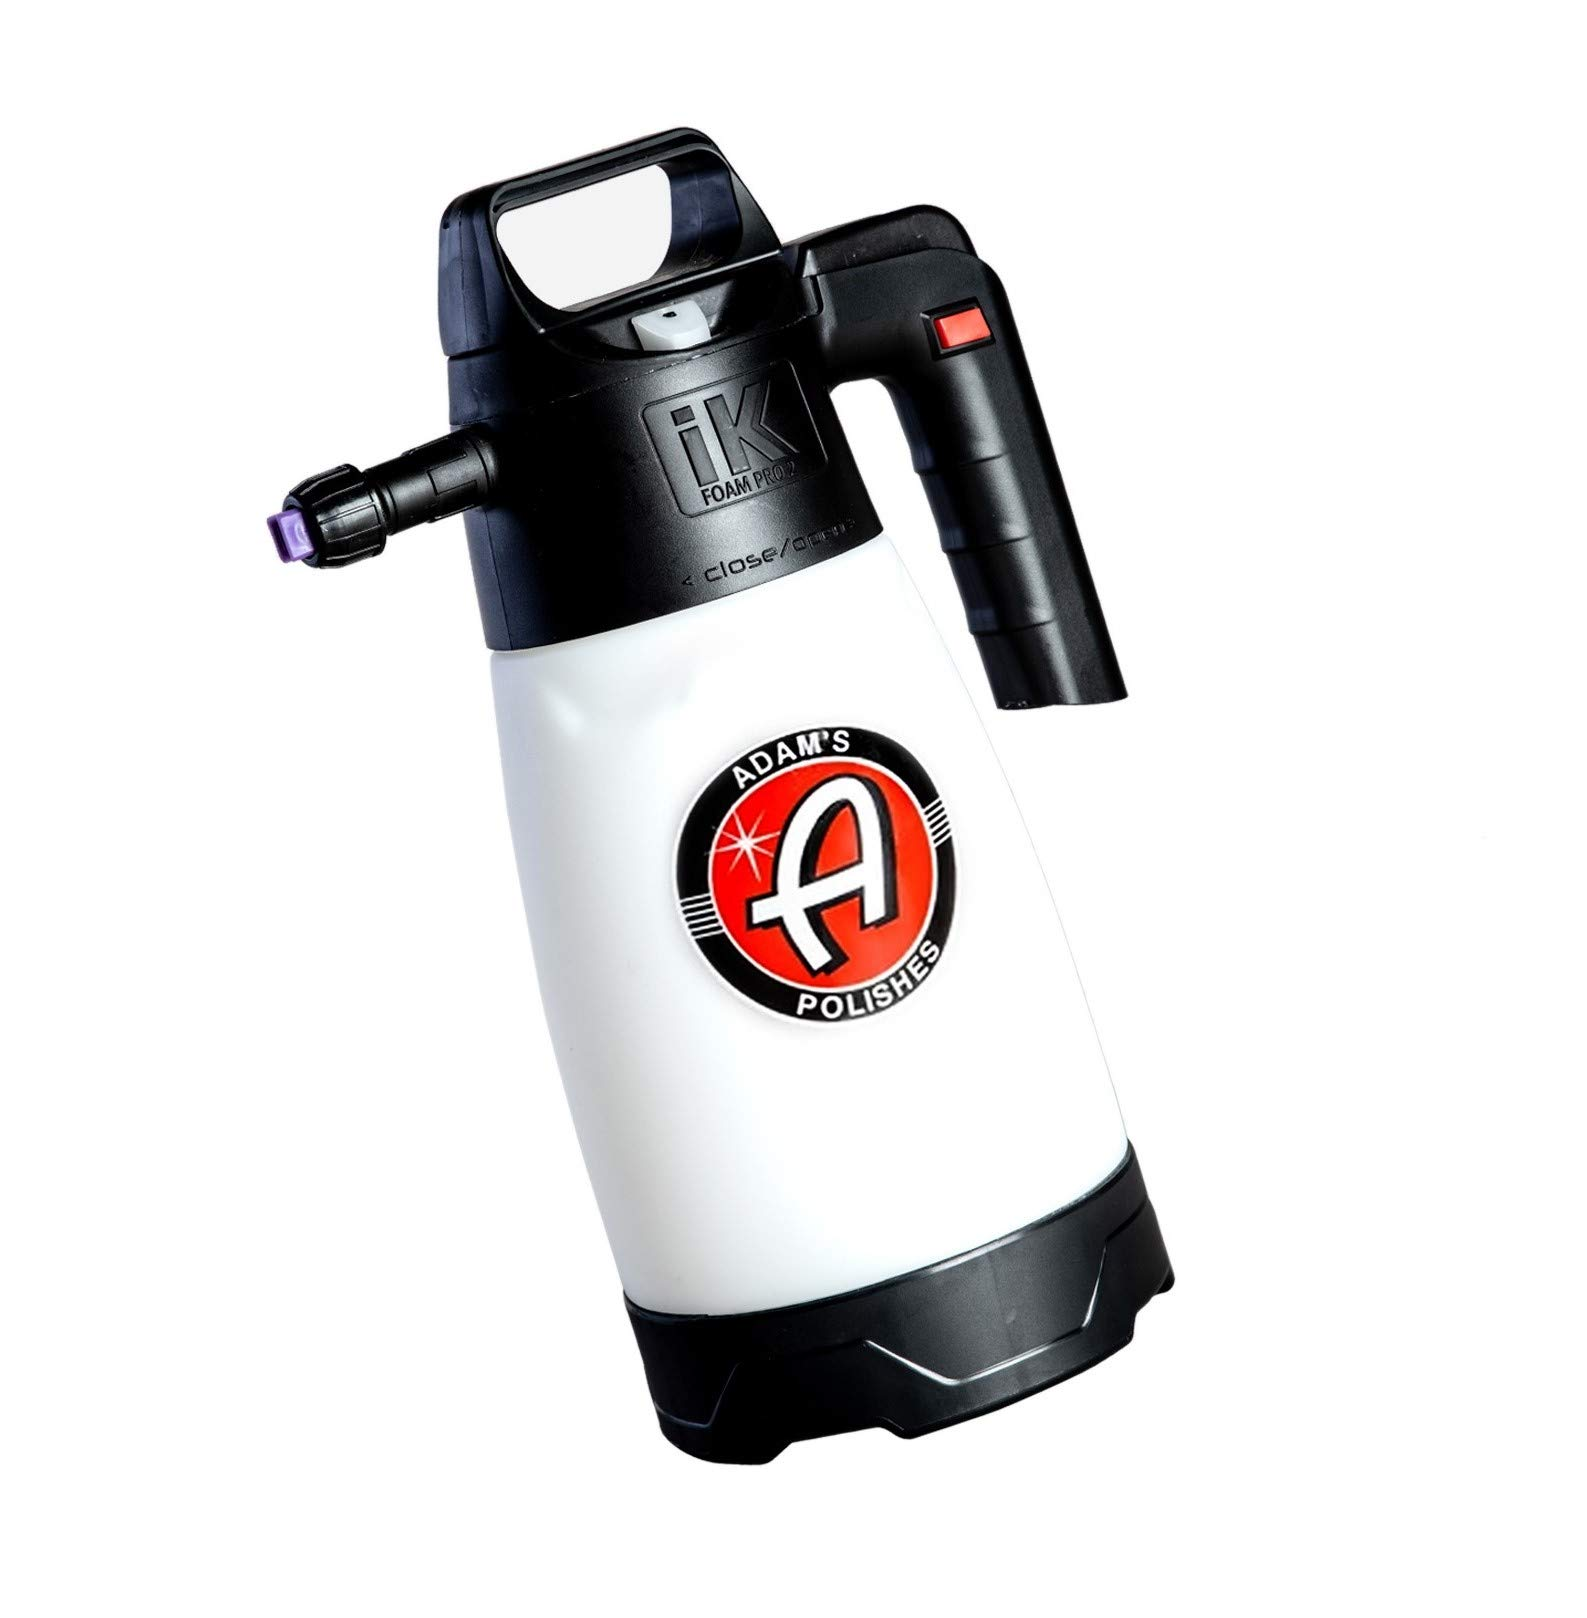 Adam's IK Pro 2 Foaming Pump Sprayer - Pressure Foam Sprayer for Car Cleaning Kit Car Wash Car Detailing | Fill with Car Wash Soap Wheel Cleaner Tire Cleaner Rim | Water Sprayer Lawn Garden Weeds